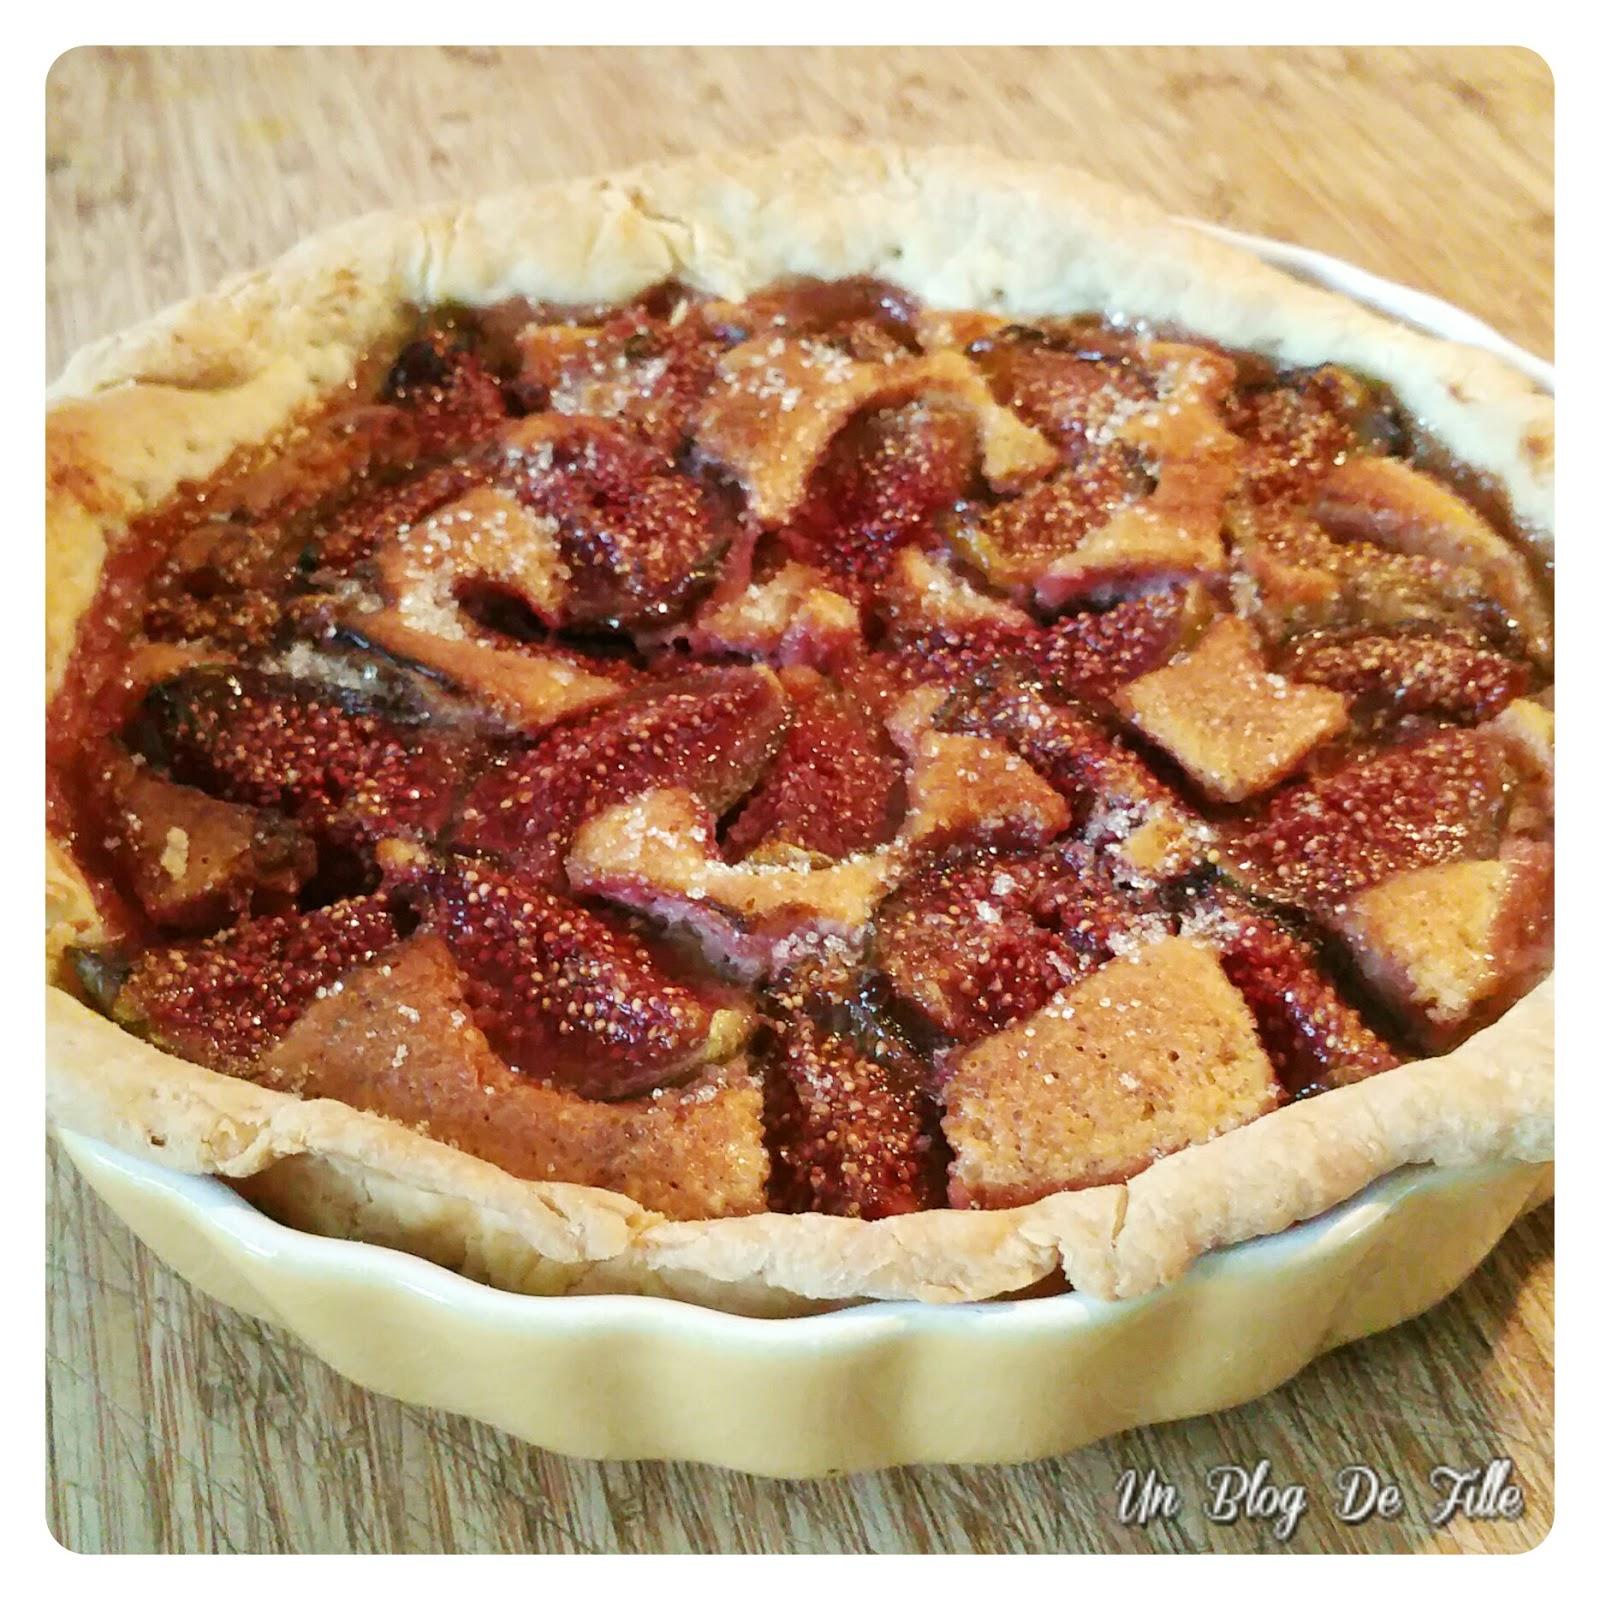 http://unblogdefille.blogspot.fr/2017/10/recette-tarte-figues-et-amande-dautomne.html